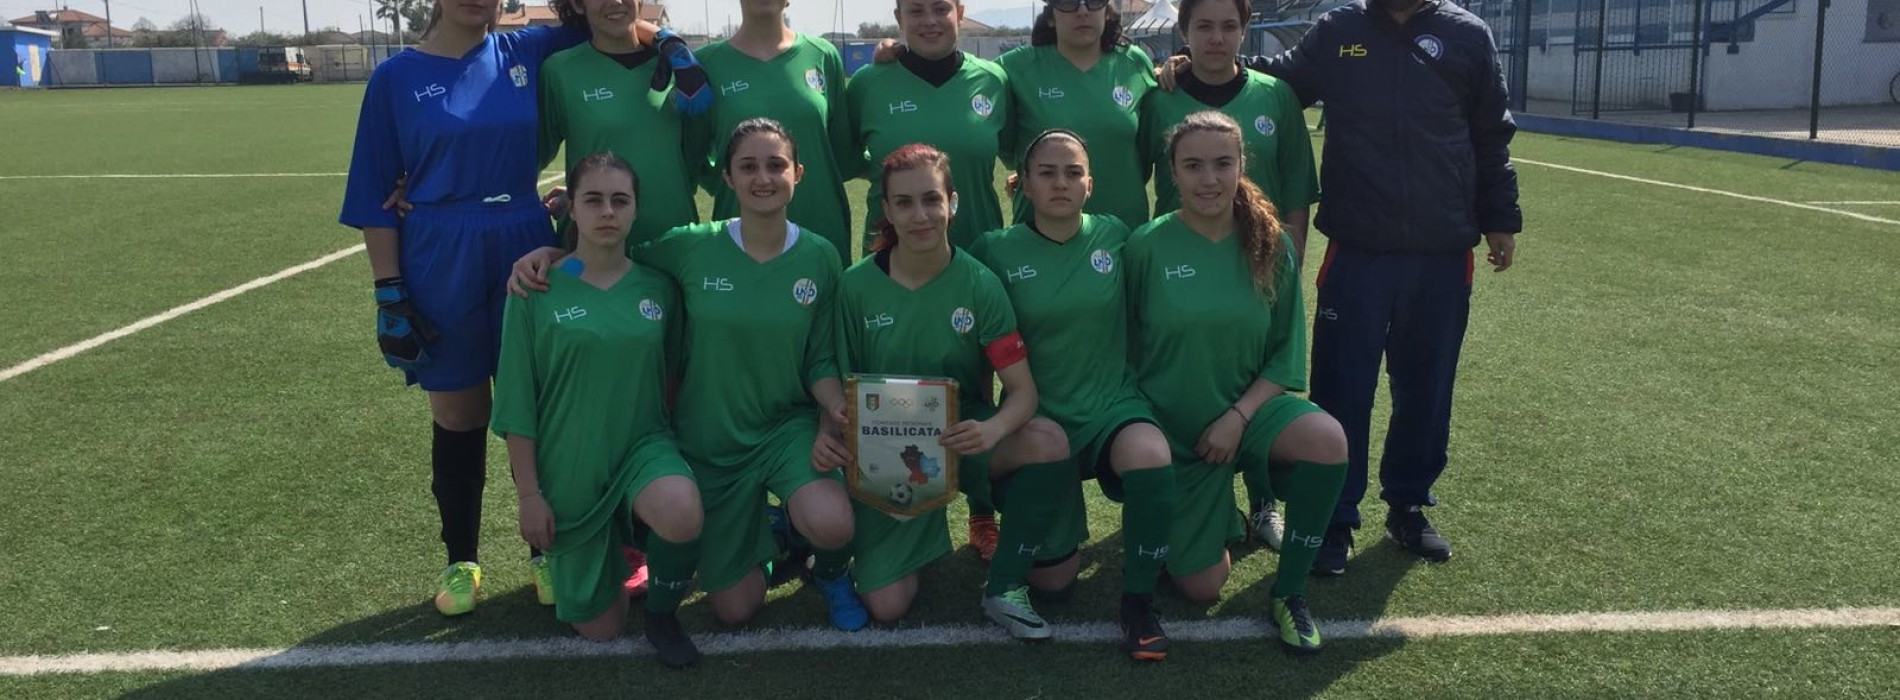 Tdr C11, Rappresentativa Femminile: la Lombardia batte la Basilicata